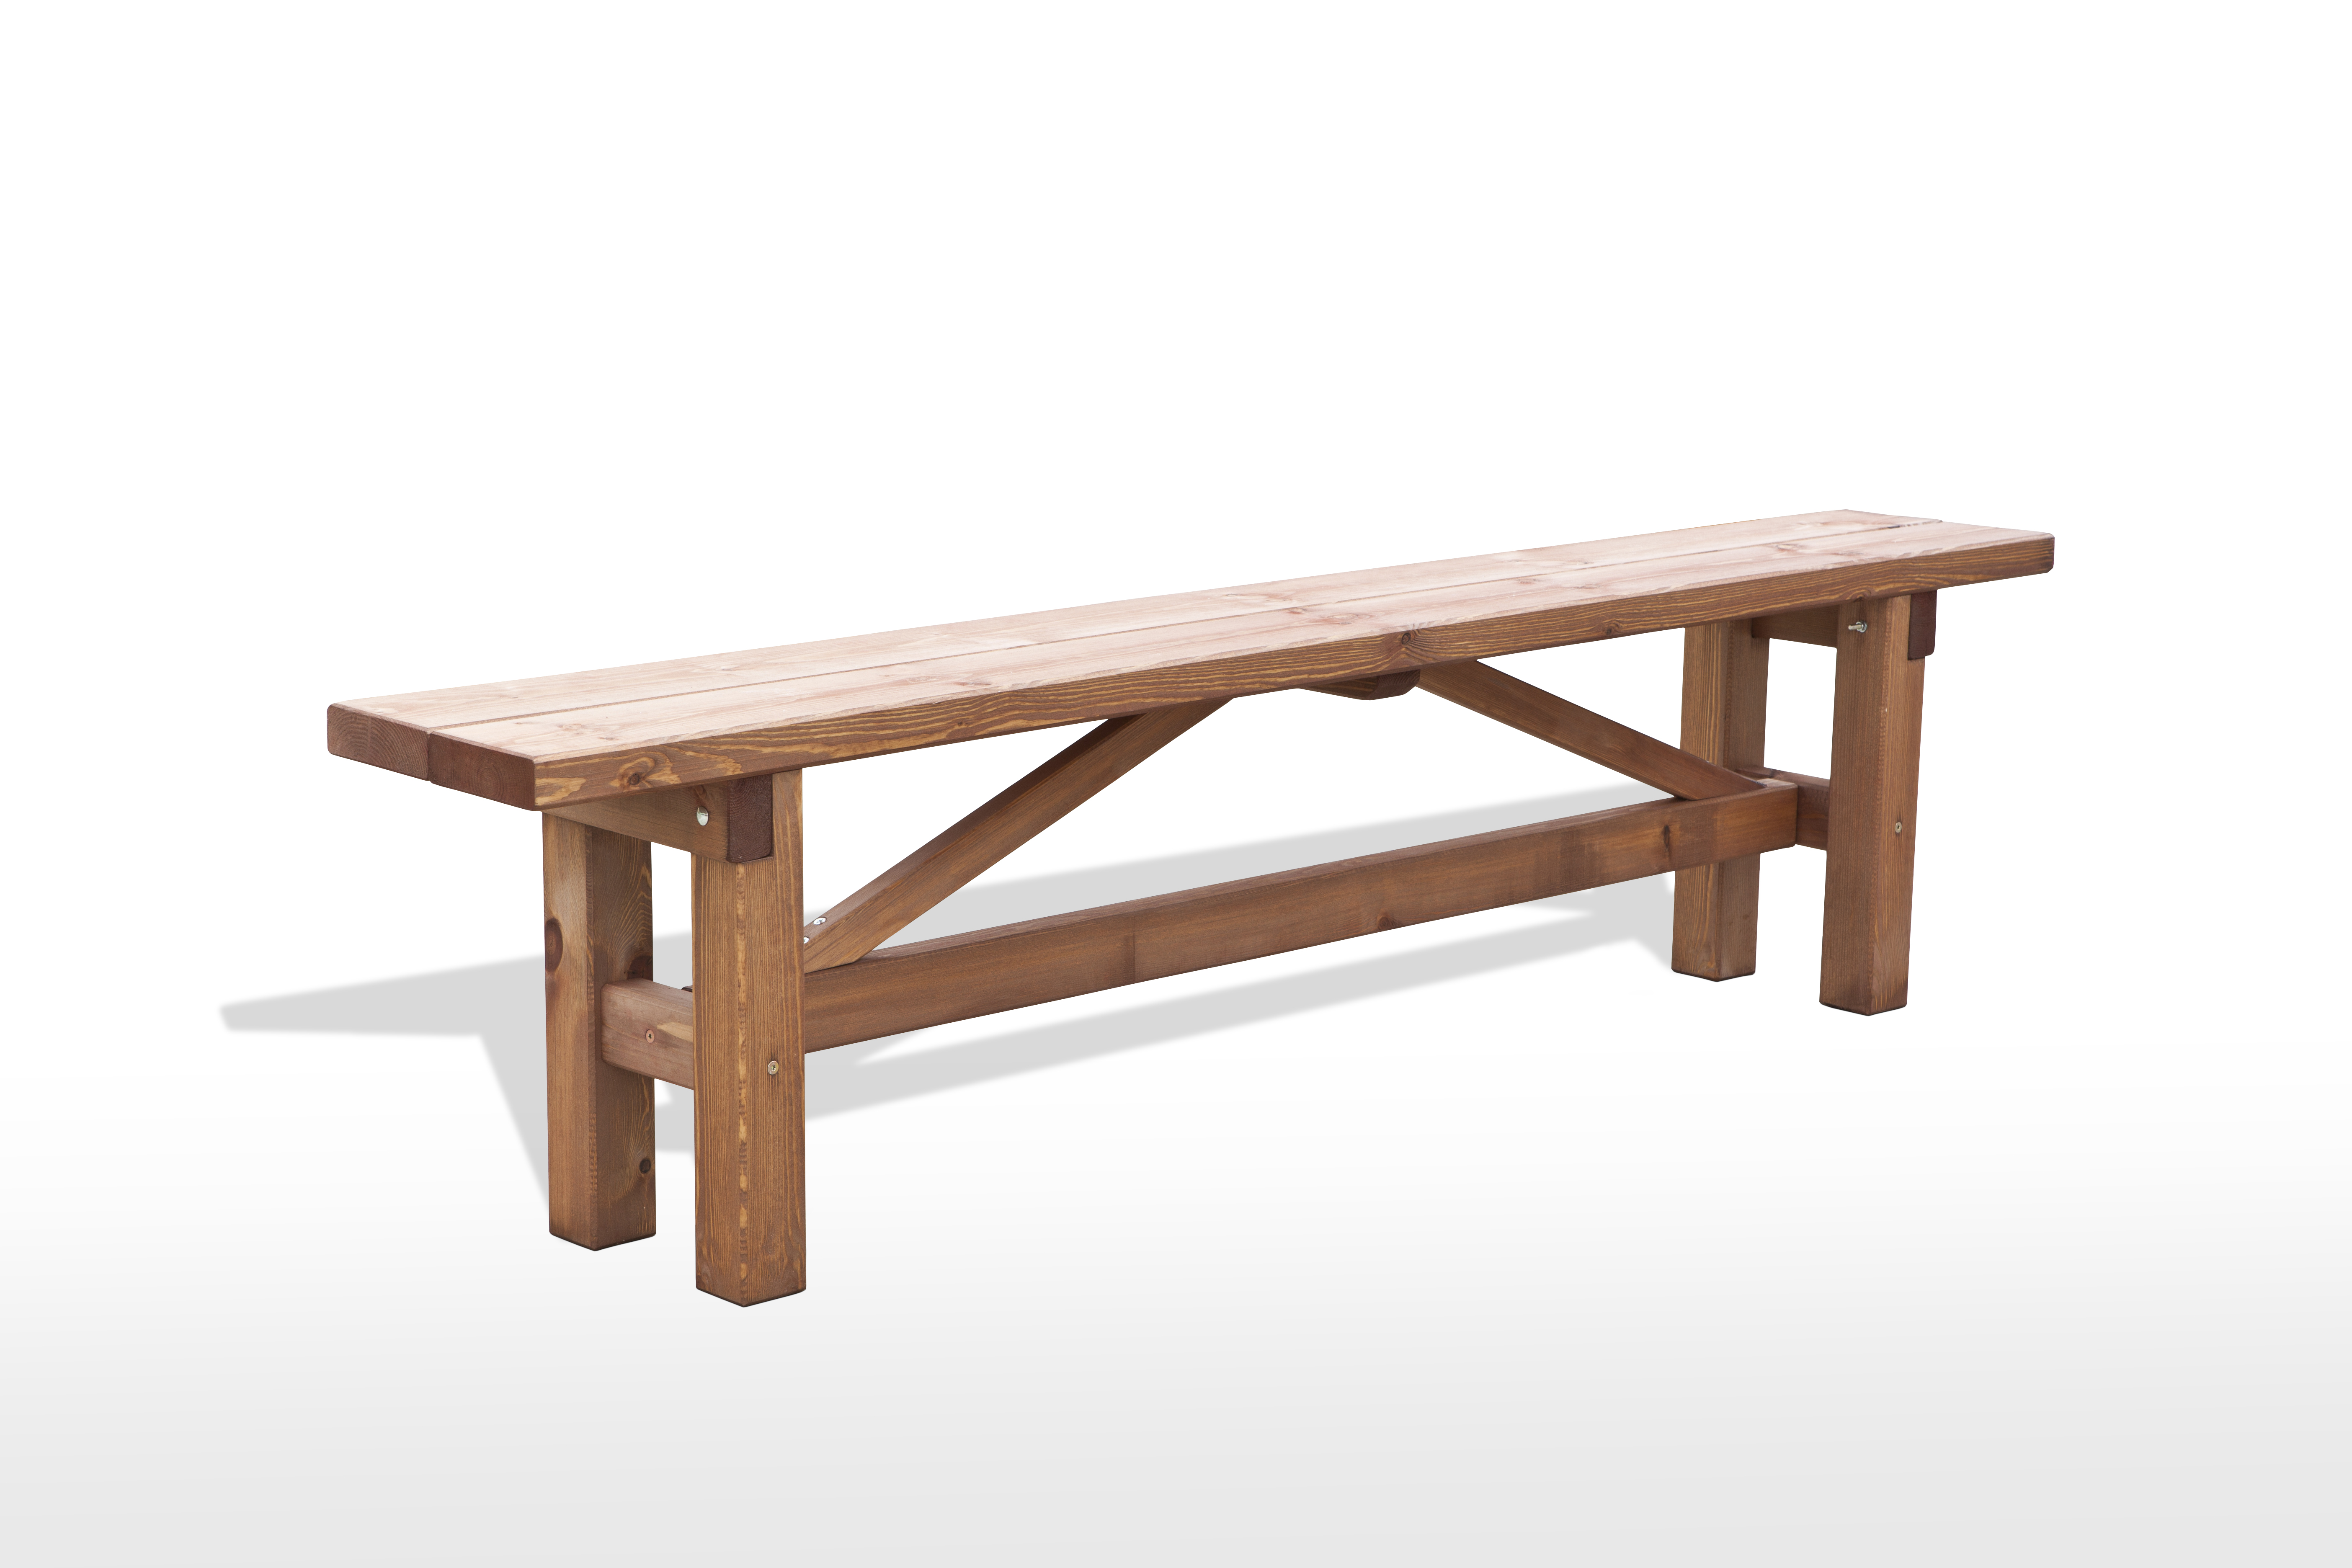 Banco de madera top bancos de madera para wallpapers - Banco de madera ...